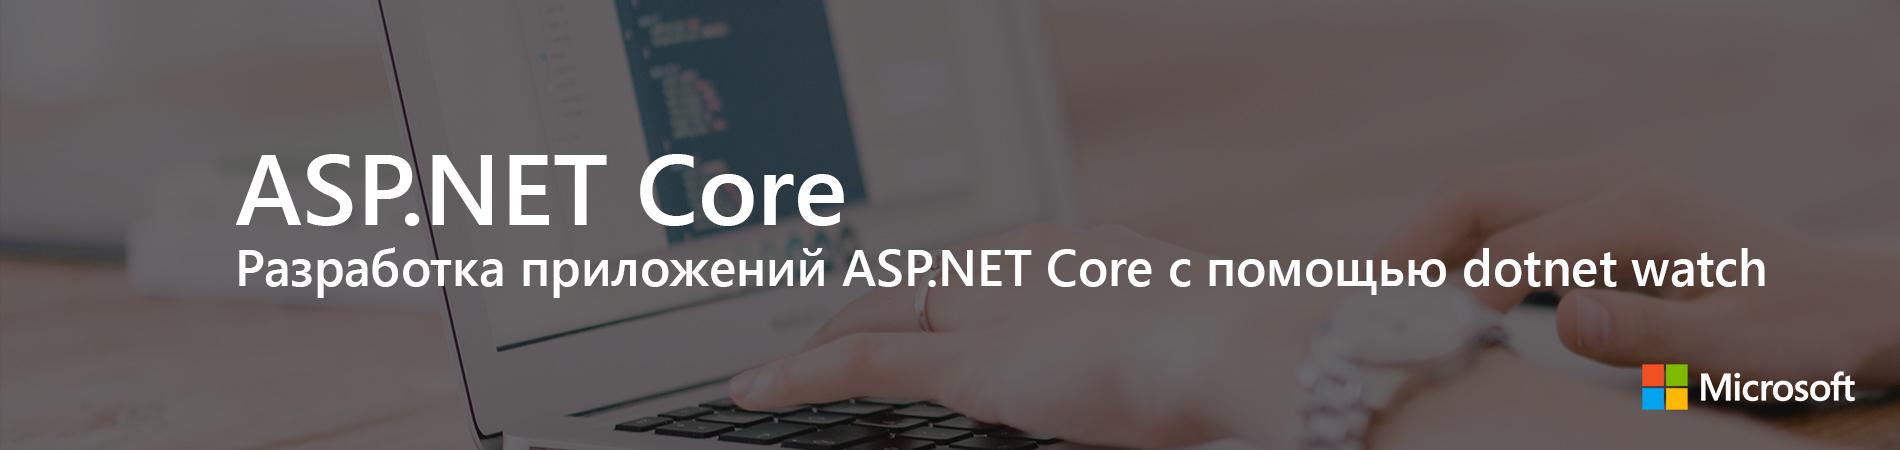 ASP.NET Core: Разработка приложений ASP.NET Core с помощью dotnet watch